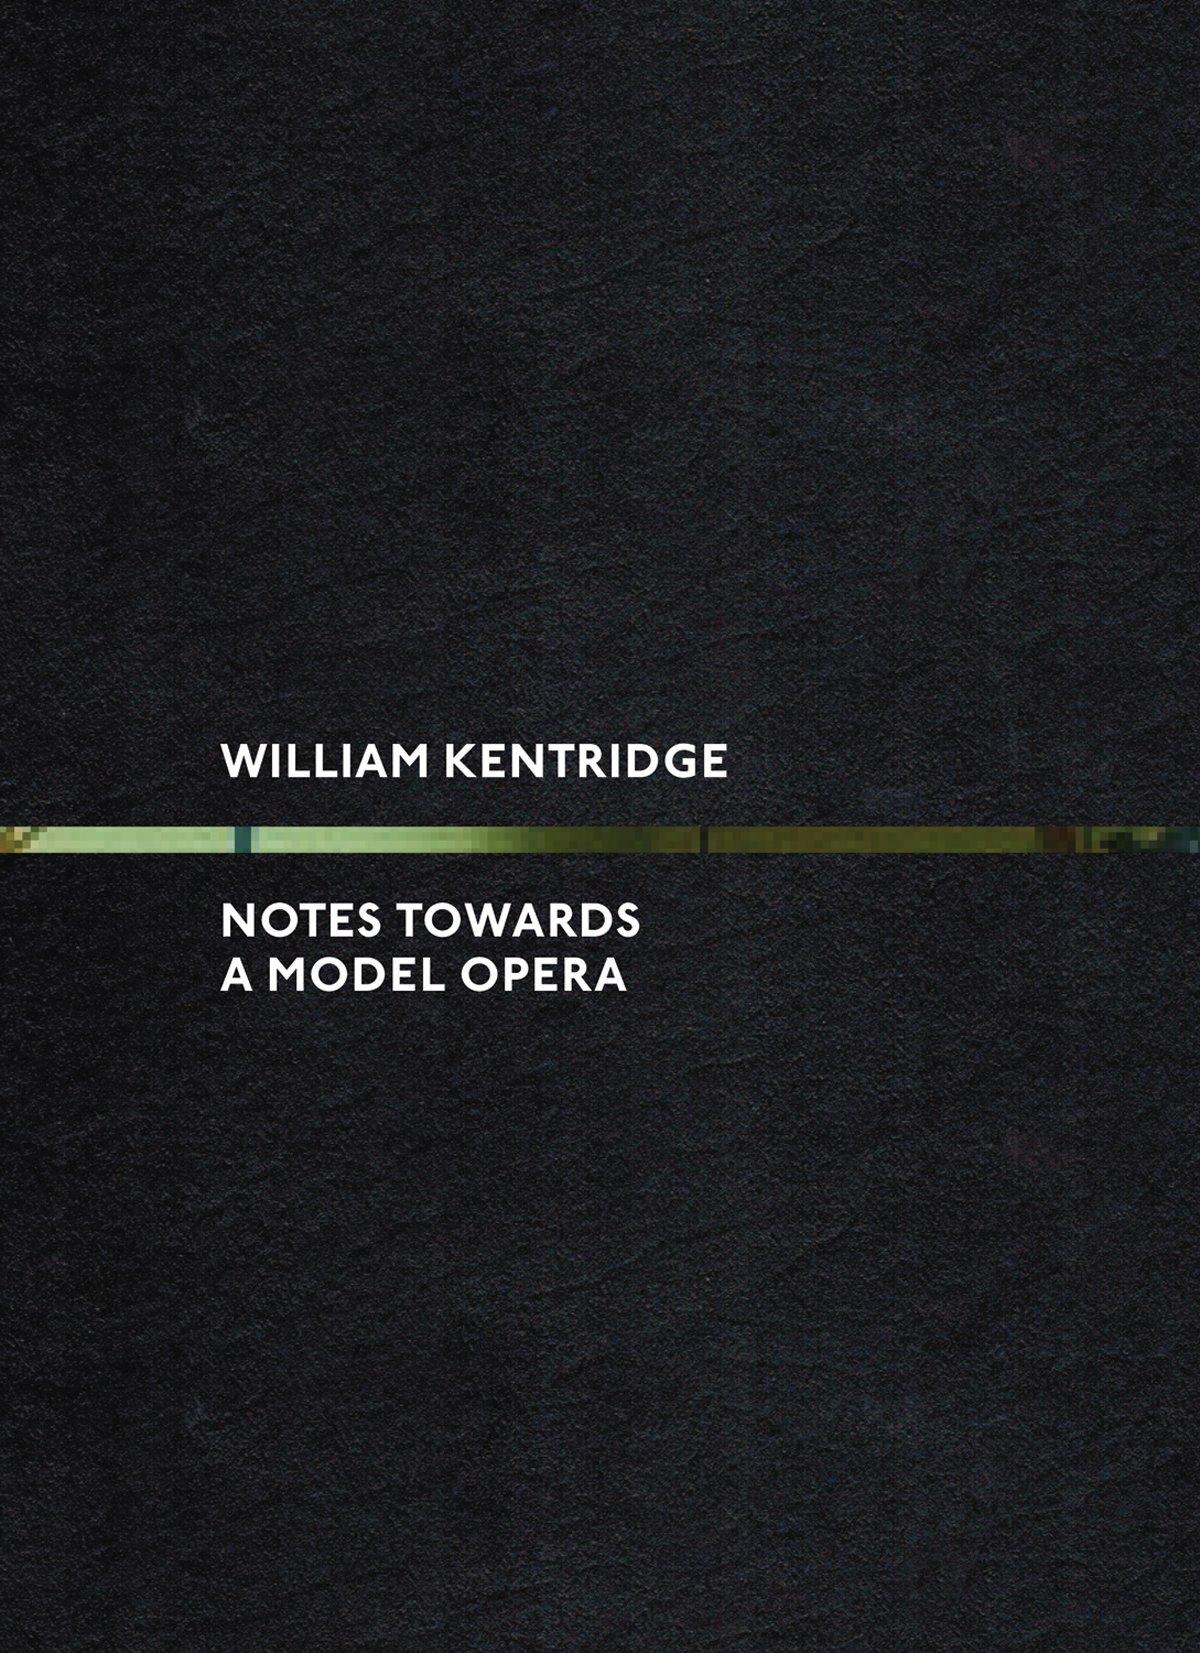 William Kentridge: Notes Towards a Model Opera pdf